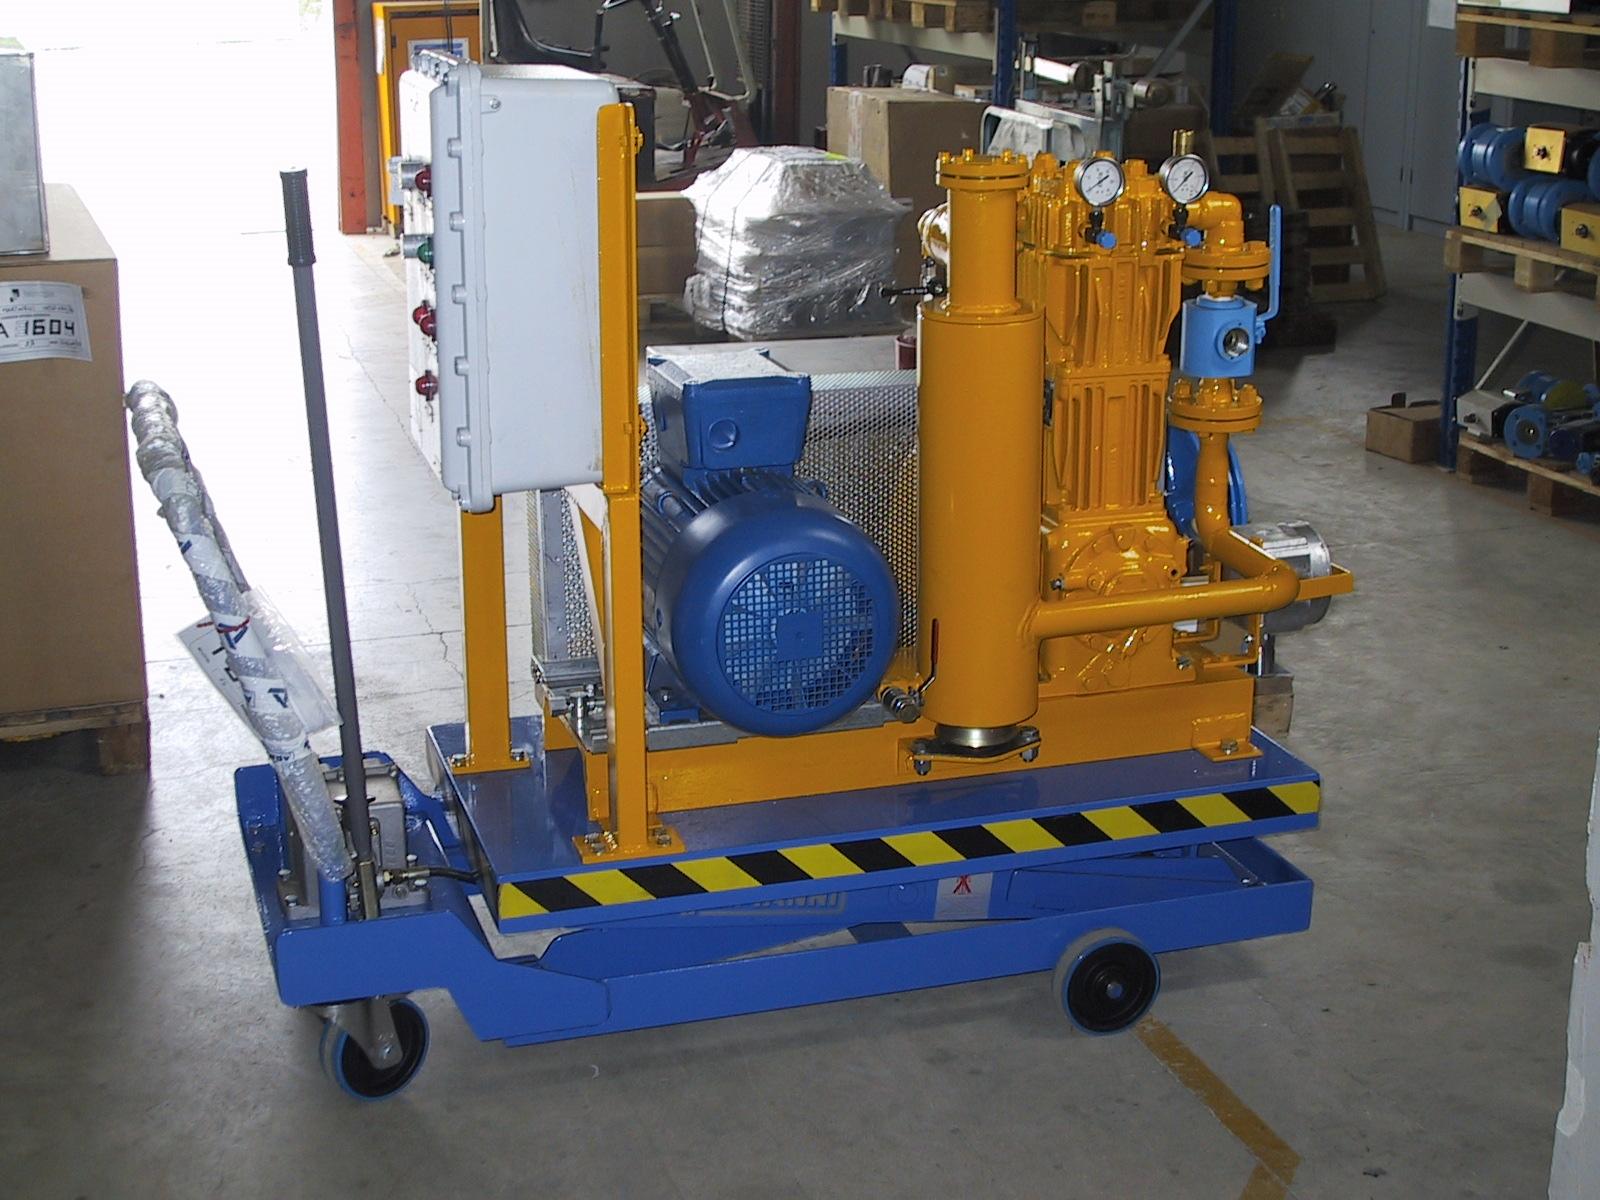 Compressore Impianto Tecnogas Gpl